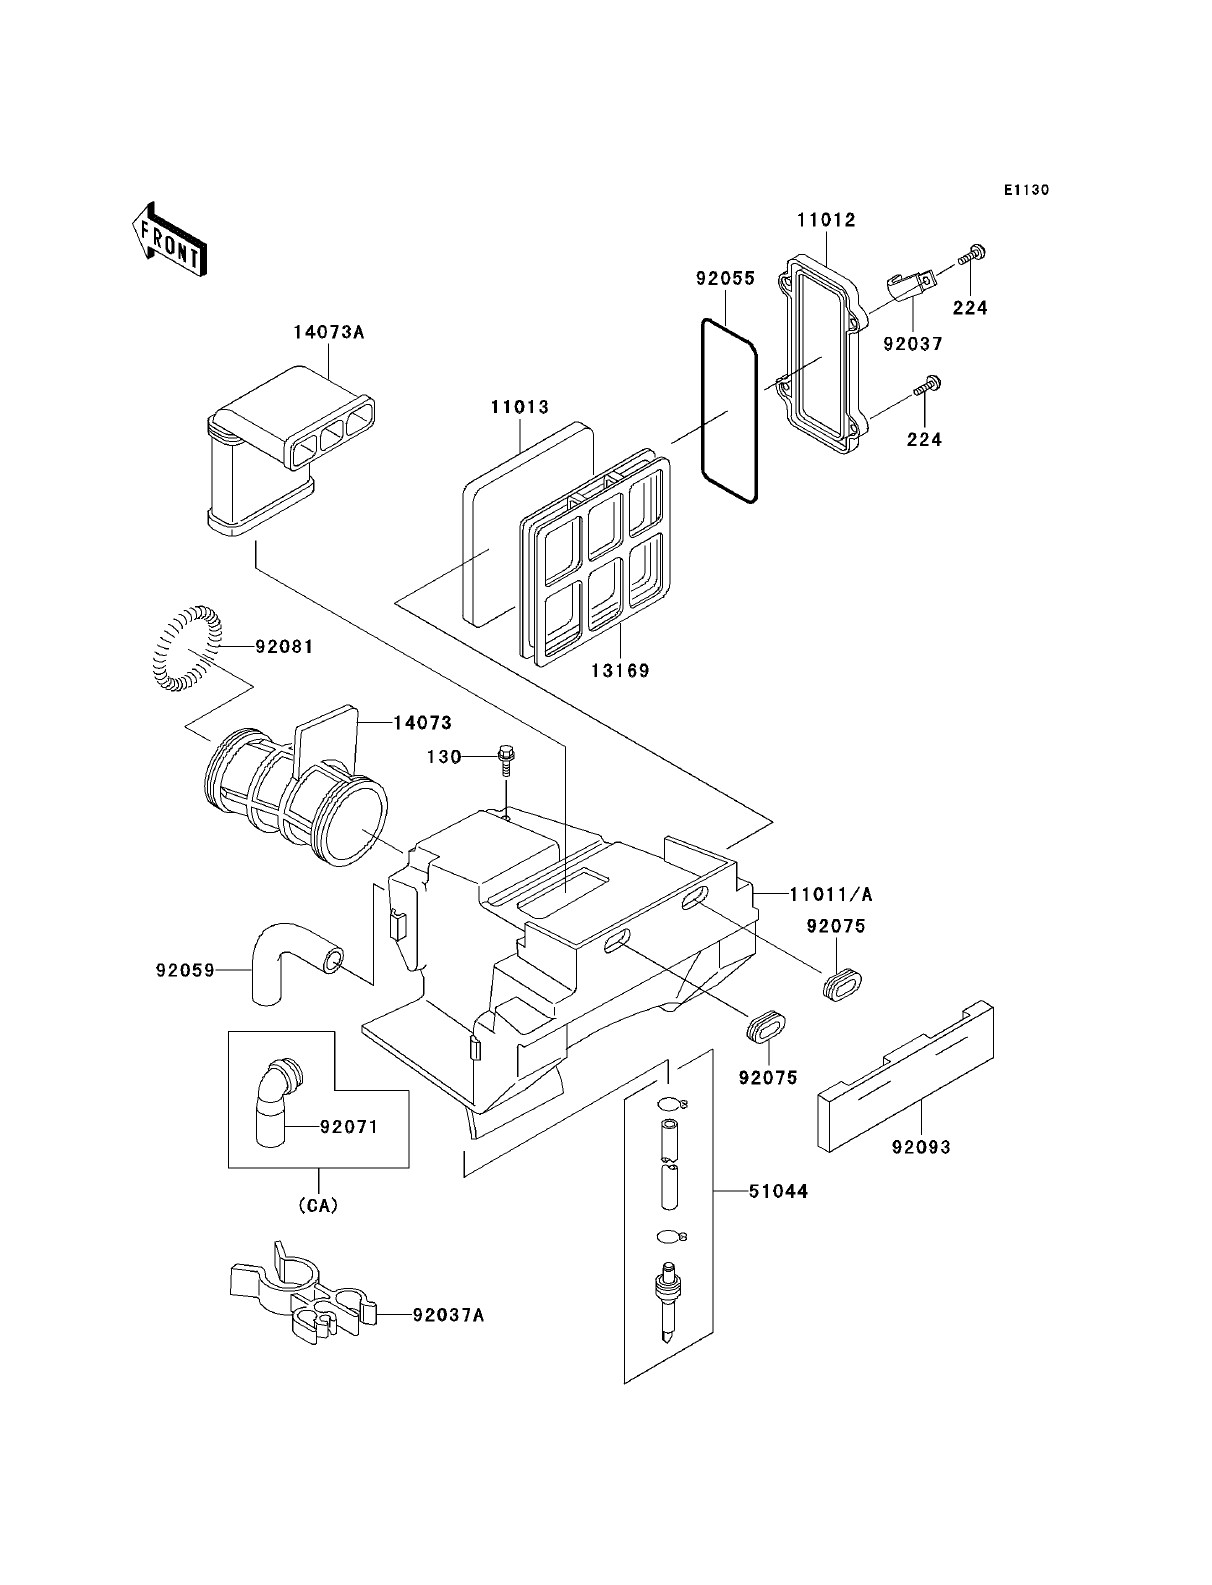 stearns brake wiring diagram wiper motor chevrolet air parts my